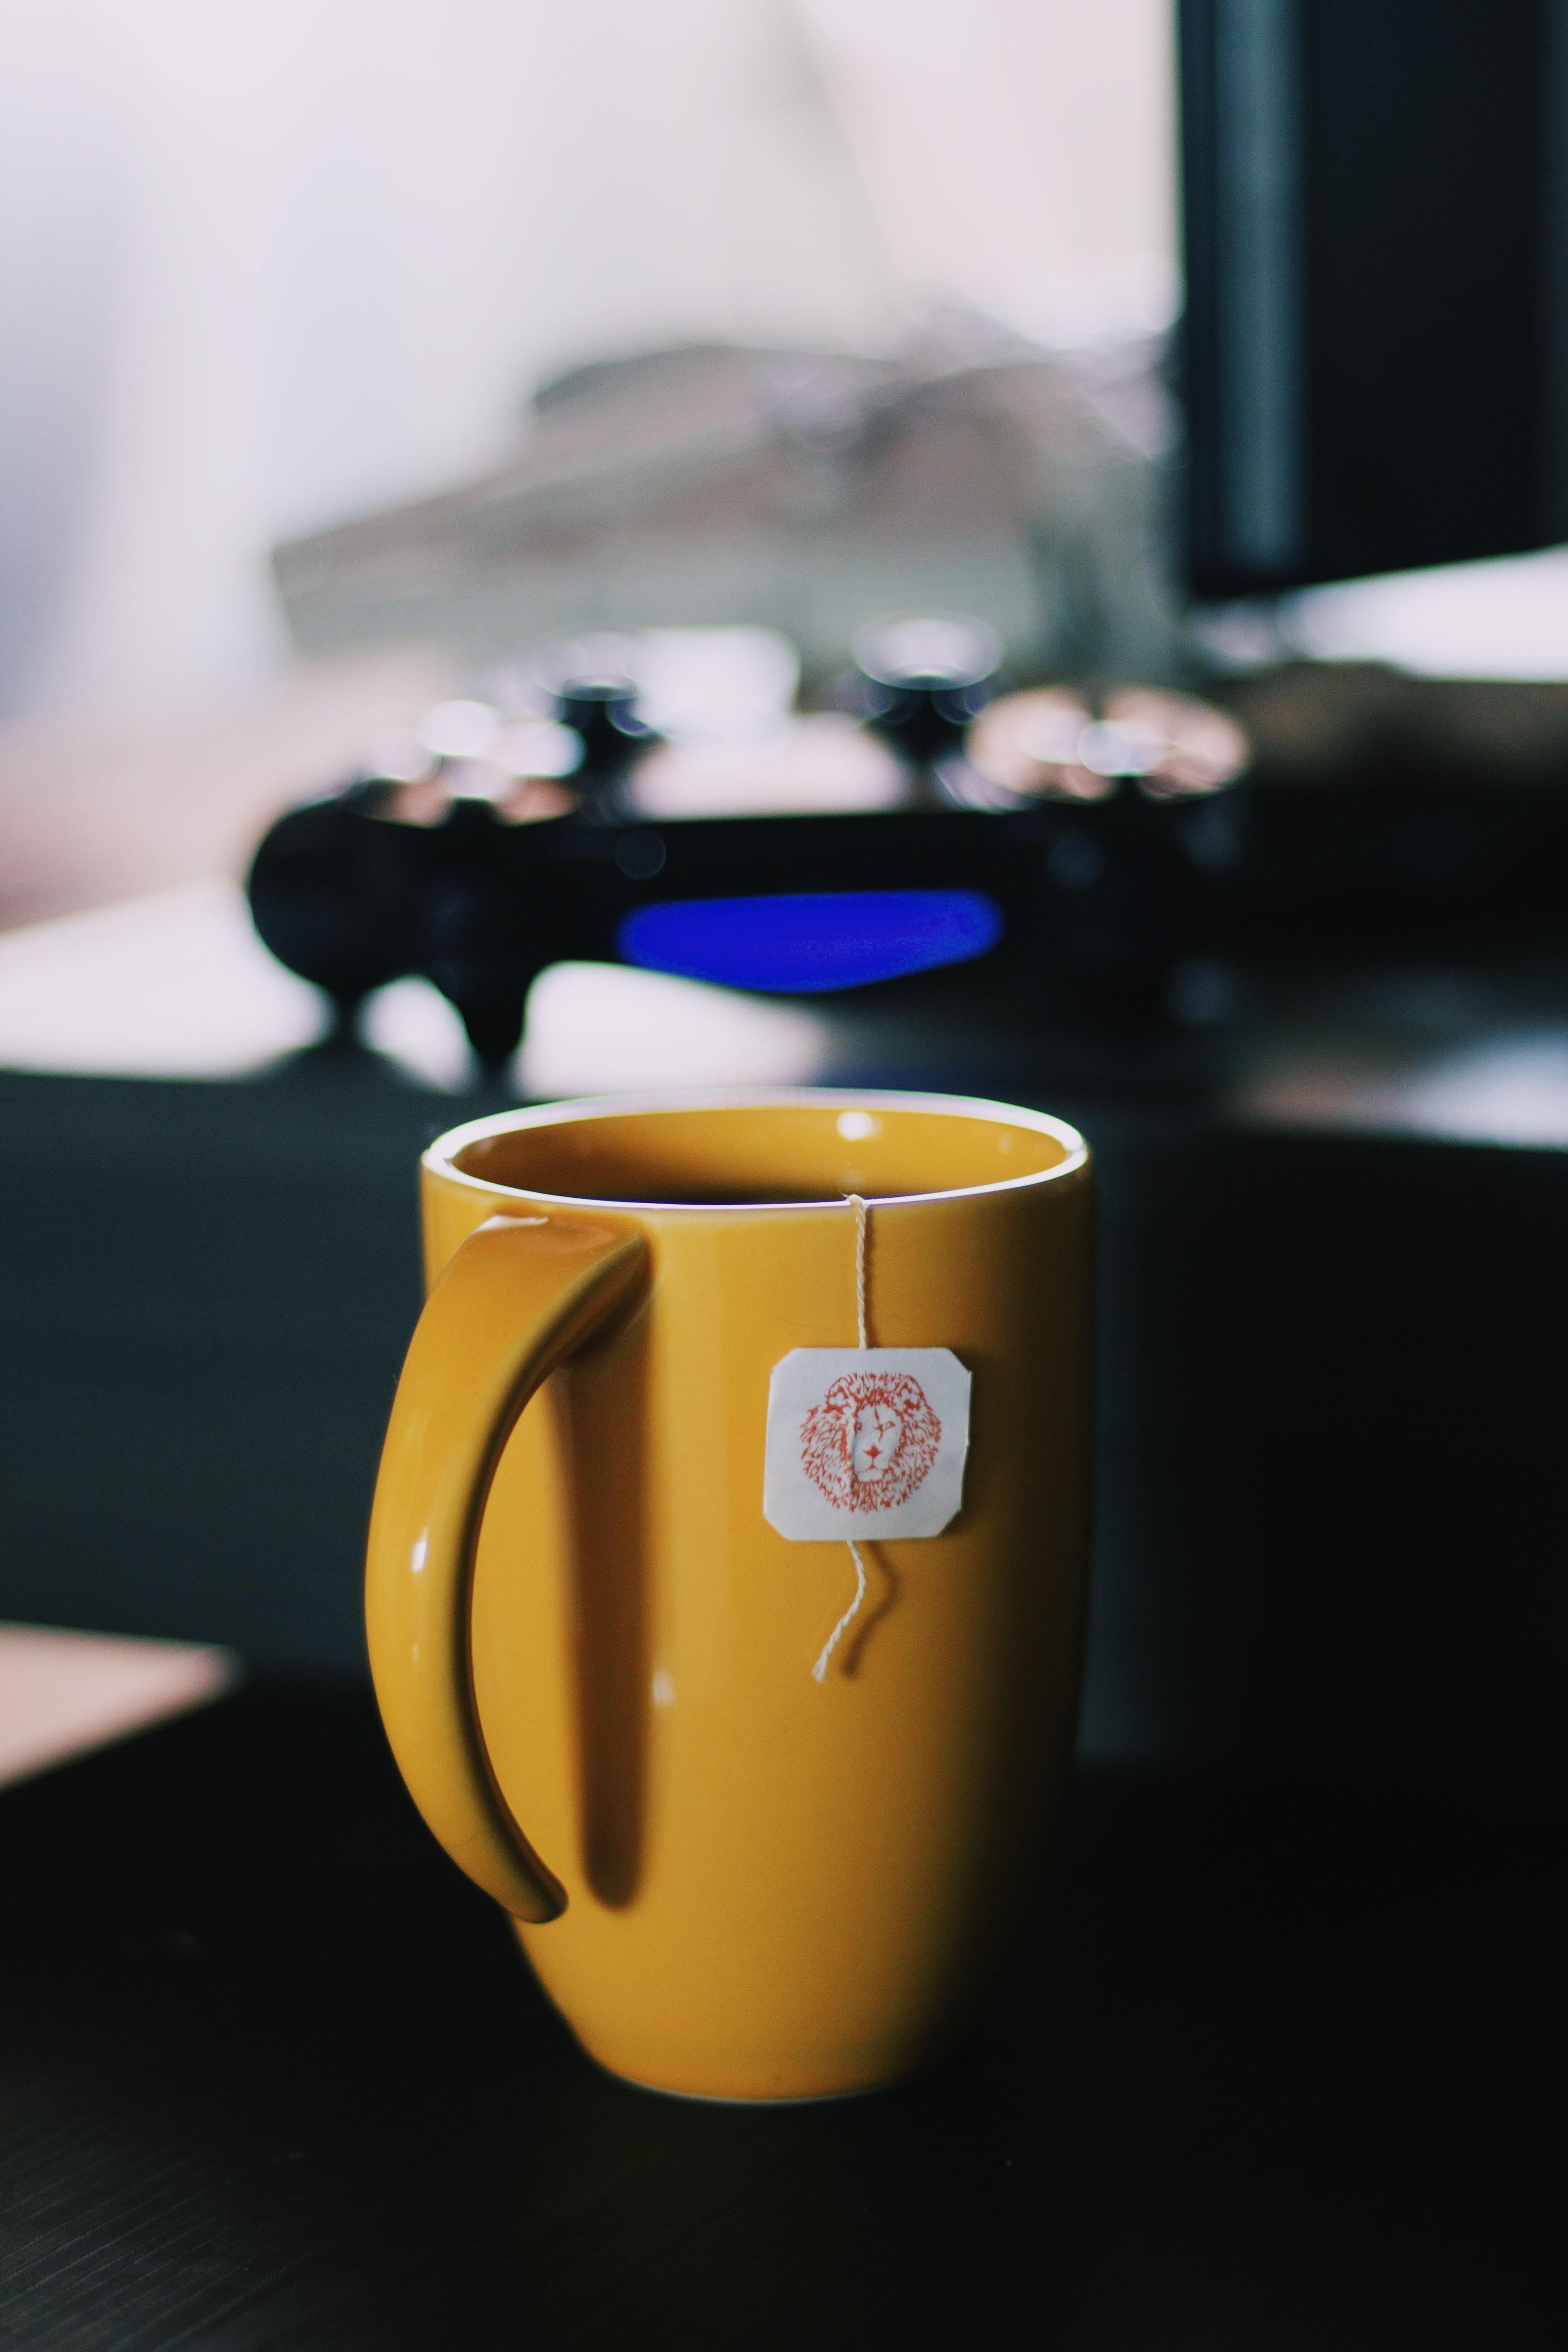 selective focus photography of ceramic mug